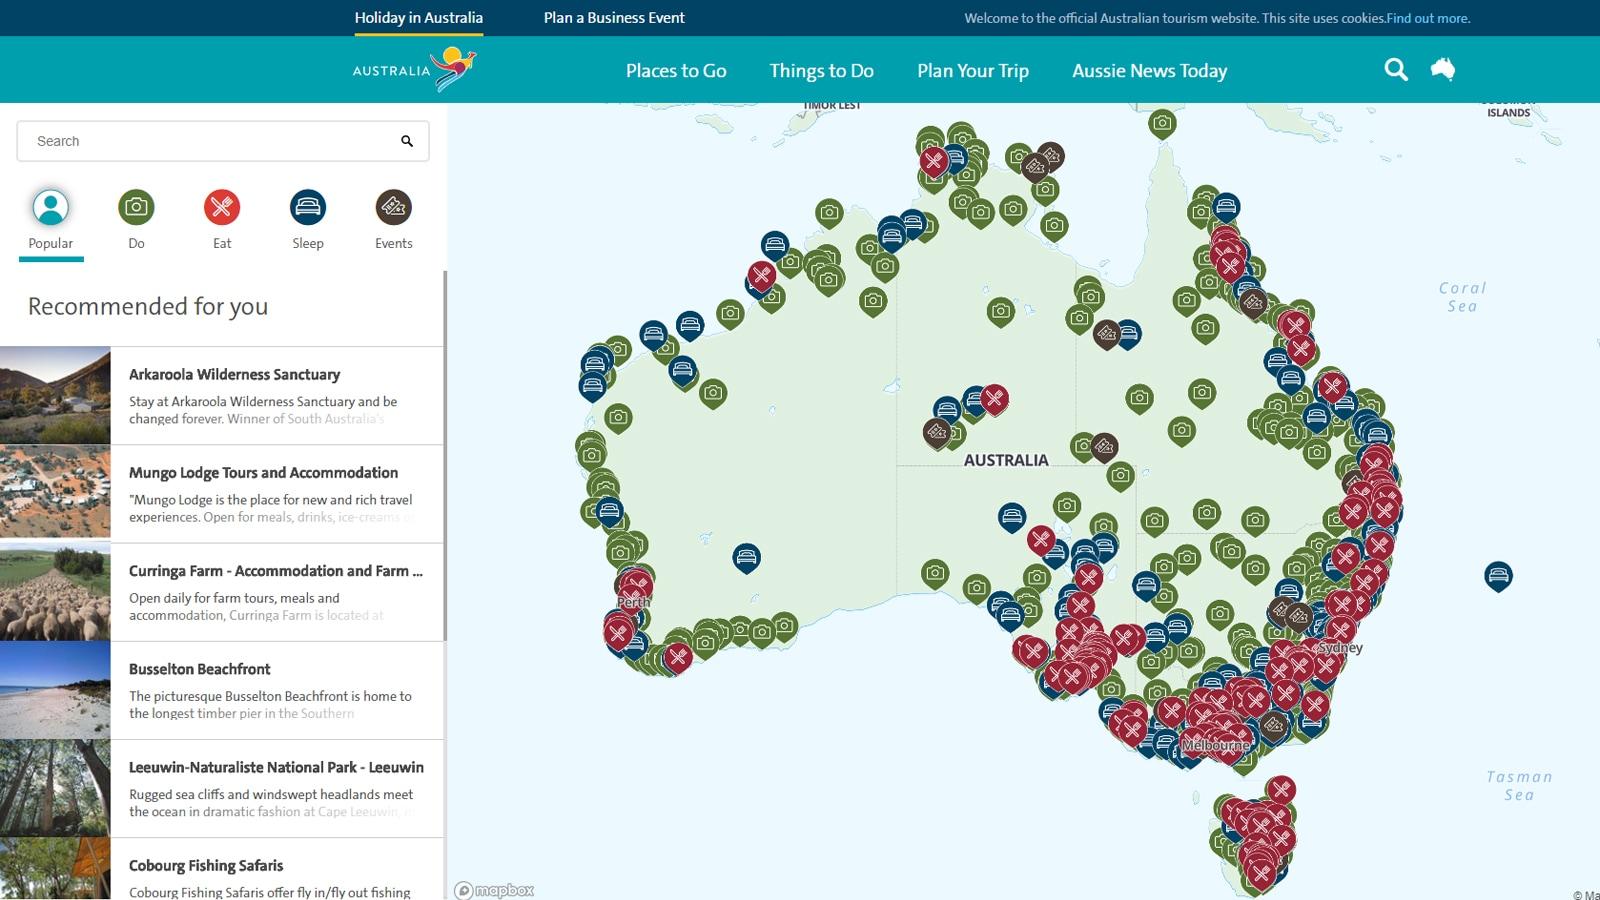 Explore Australia by map - Tourism Australia